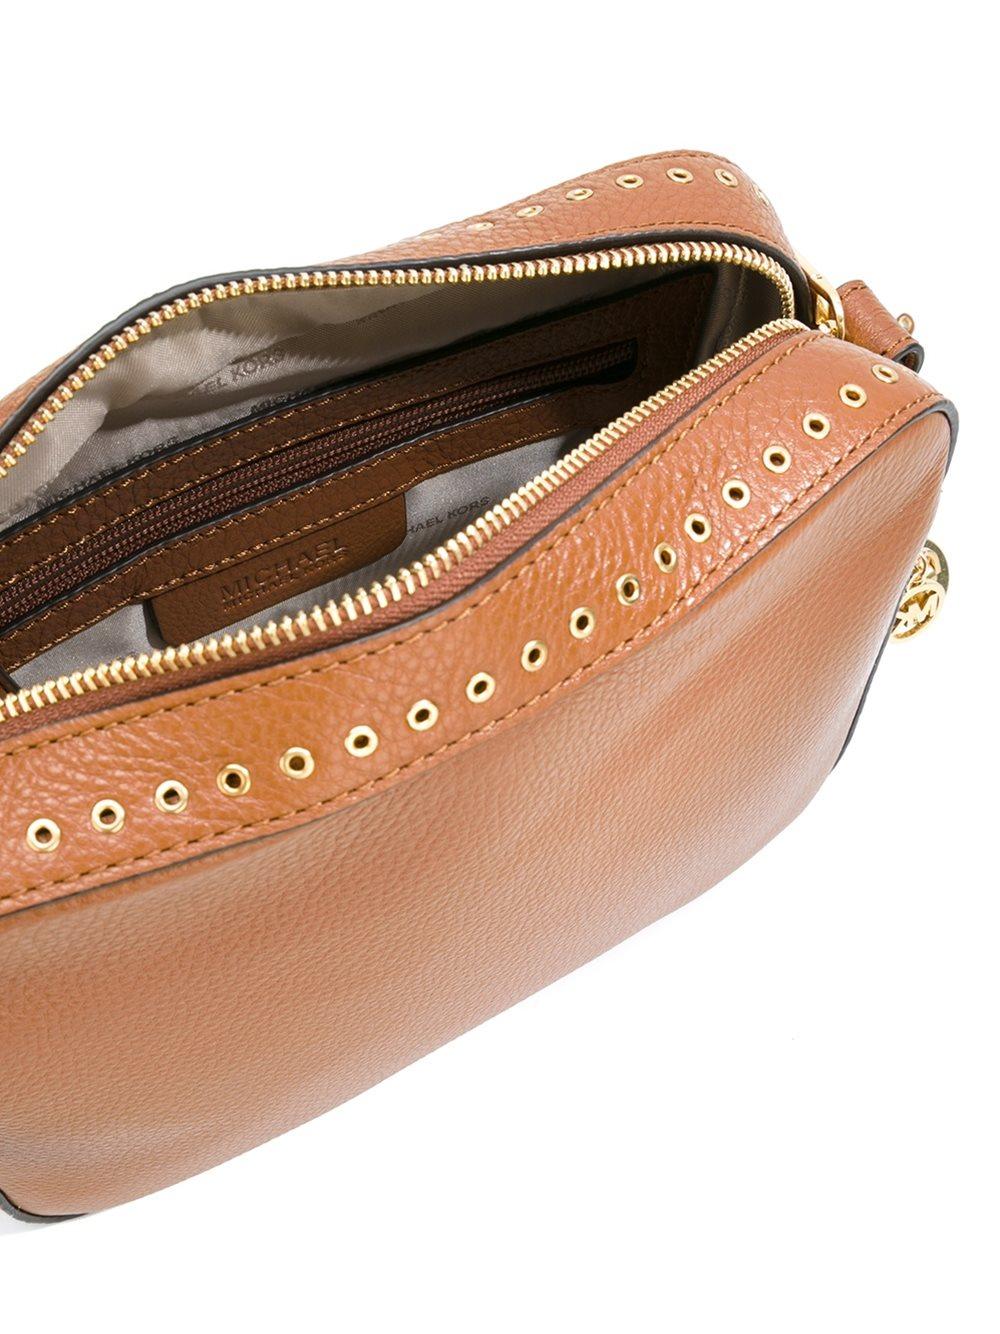 MICHAEL Michael Kors Leather 'brooklyn' Crossbody Bag in Brown